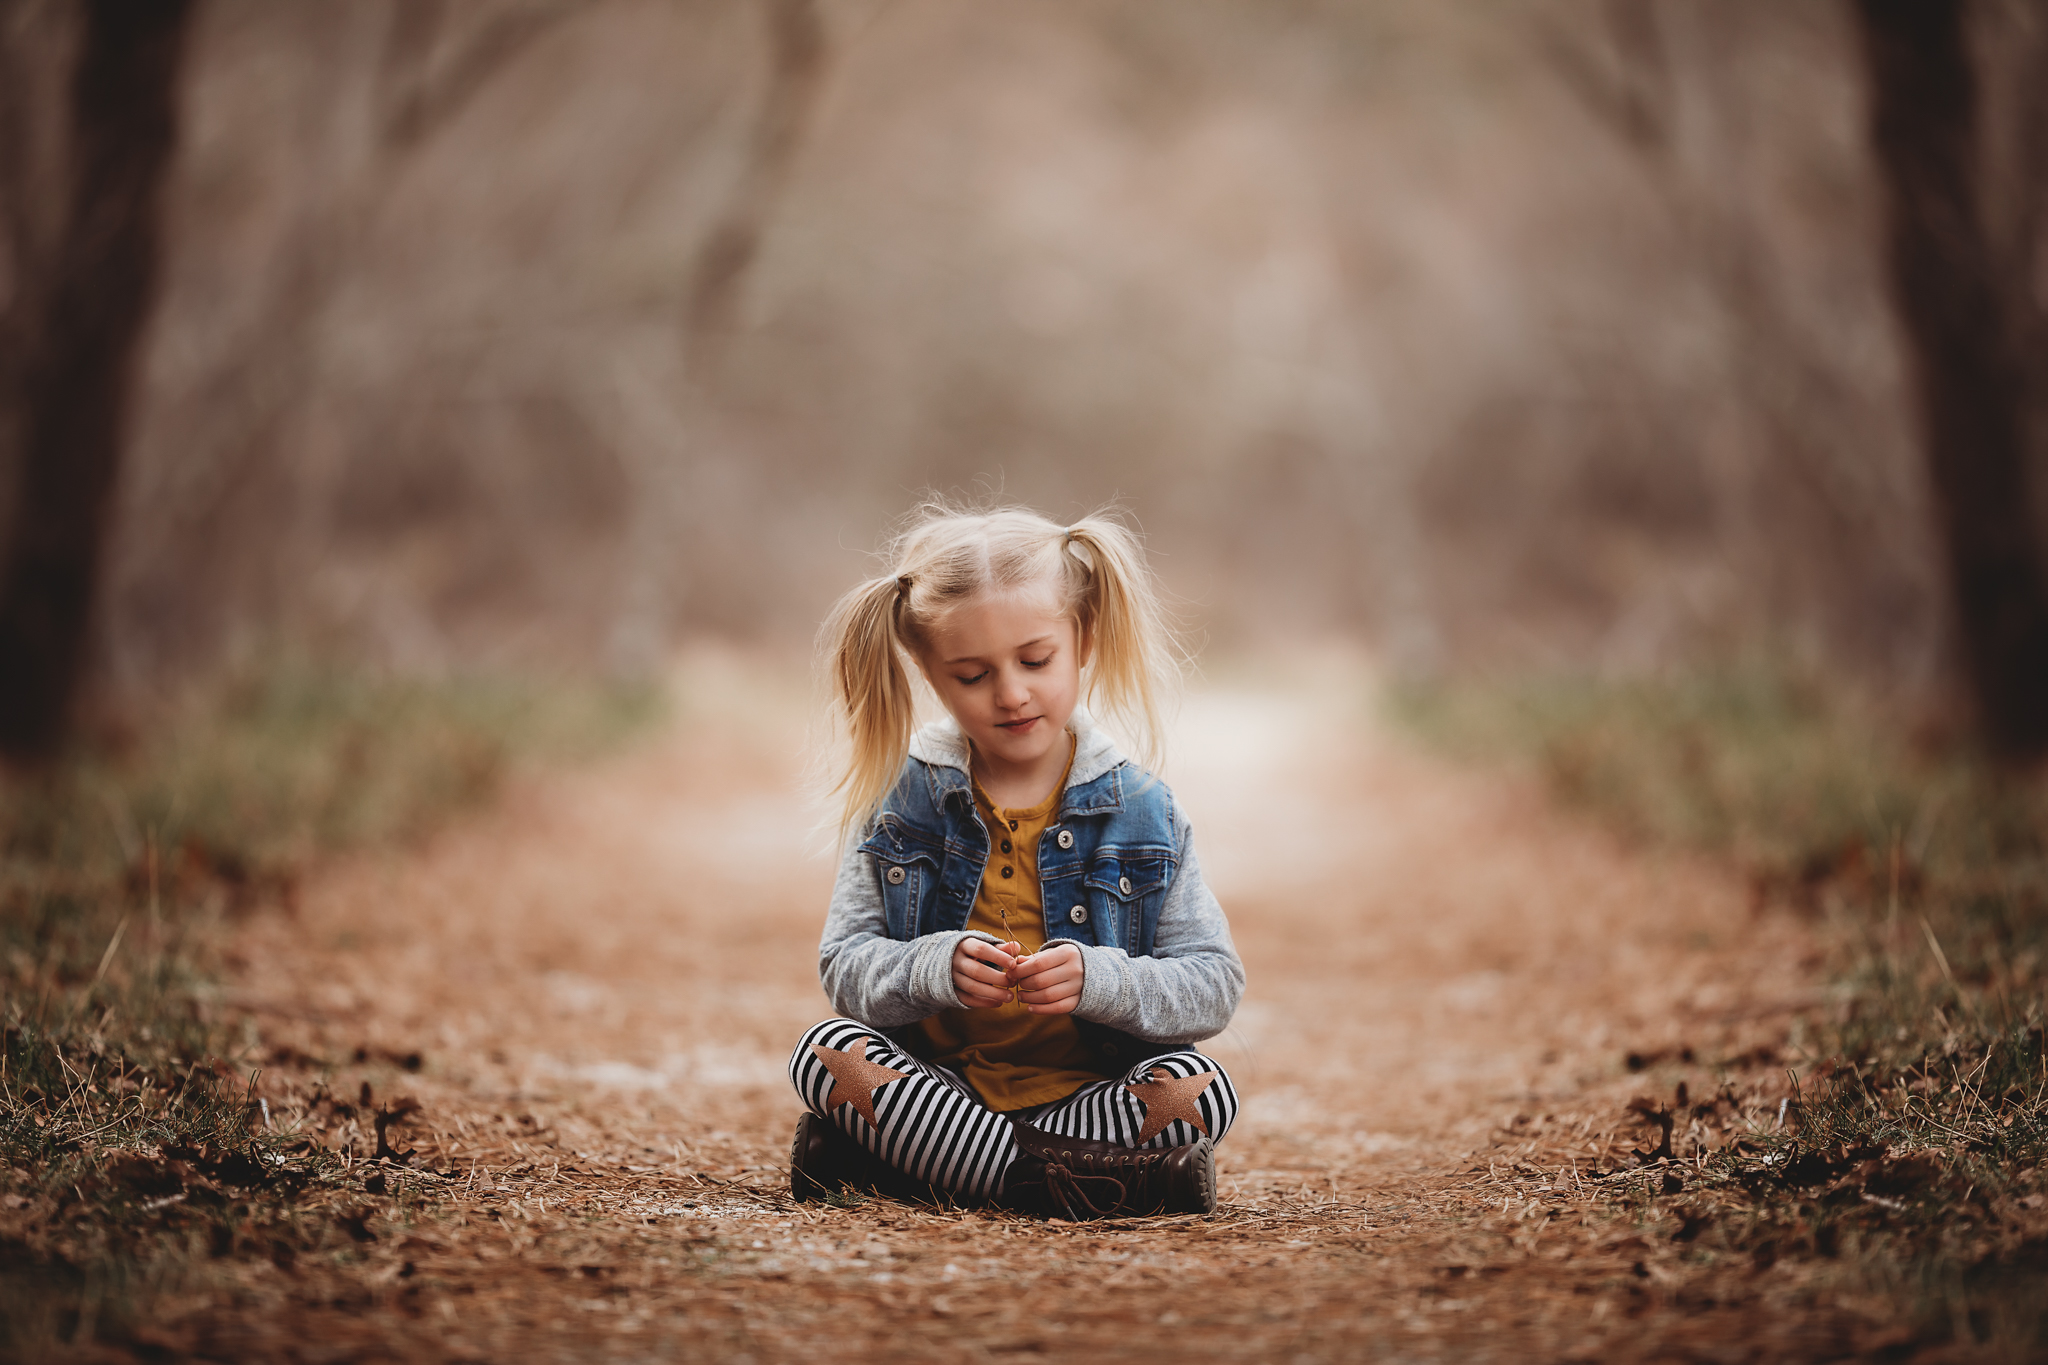 Long-island-photographer-hello-olivia-photography-children-kids-photos-new-york-lifestyle-portraits-suffolk-County-LI-58.jpg